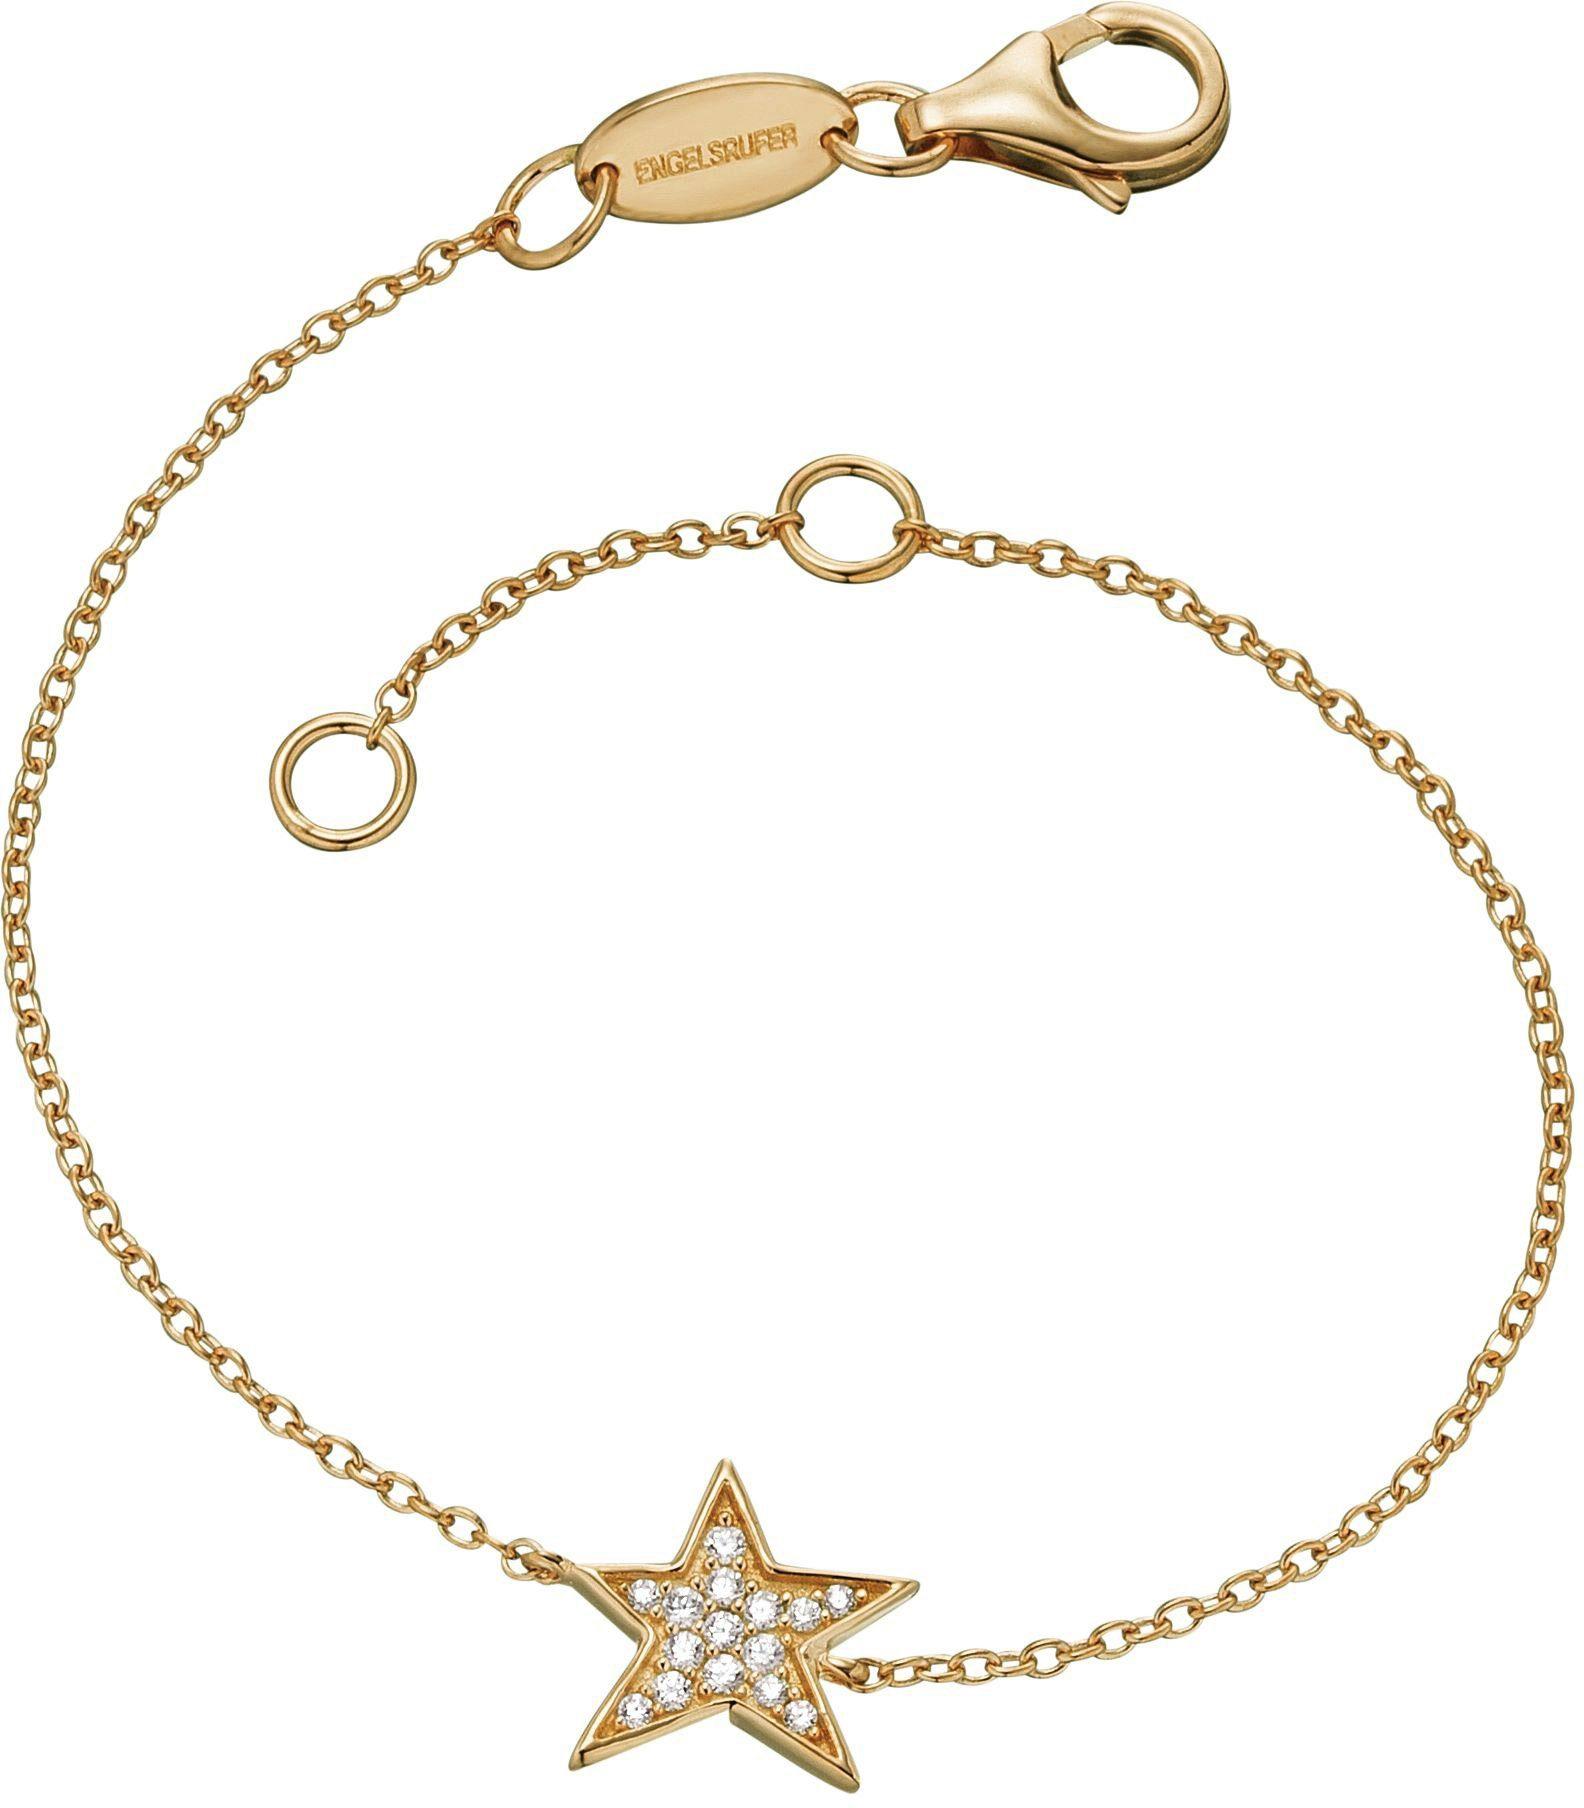 Engelsrufer Silberarmband »Little magic, ARMBAND STERN MIT ZIRKONIA GOLD PLATED, ERB-LILSTAR-ZI-G«, mit Zirkonia